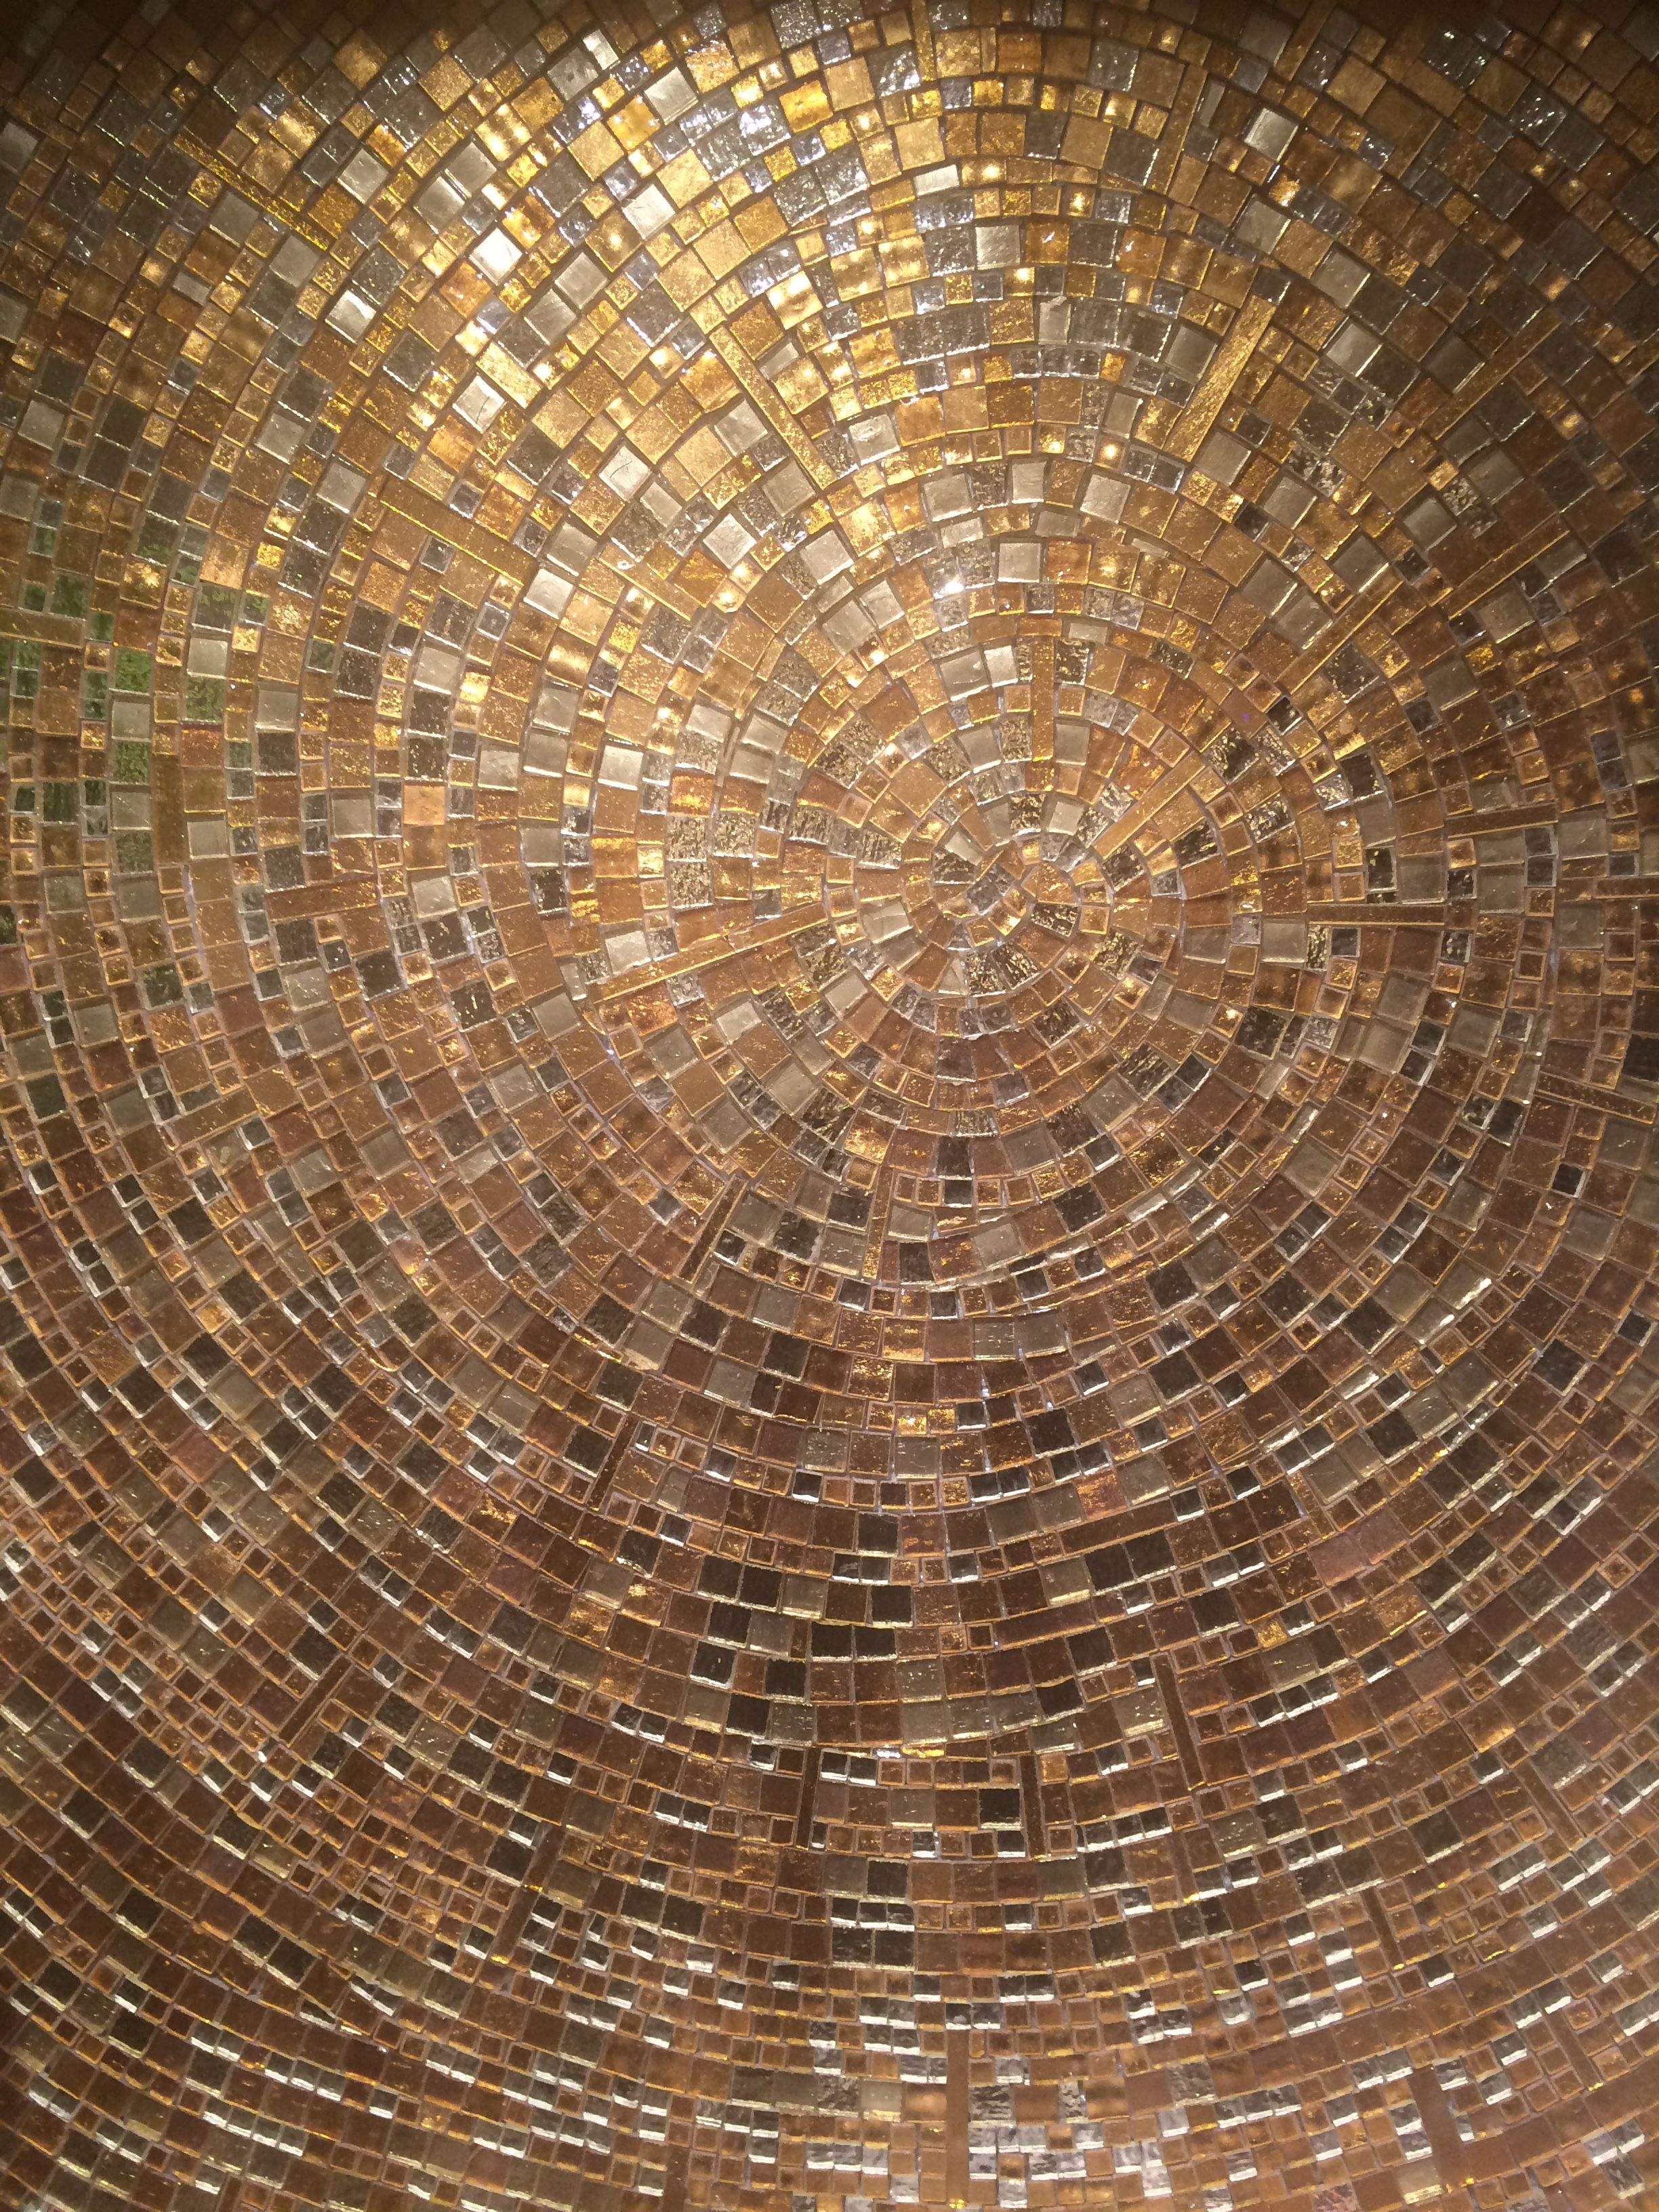 mosaik kunst bisazza verkleidung, sicis london mayfair showroom | sicis mosaics | pinterest, Design ideen